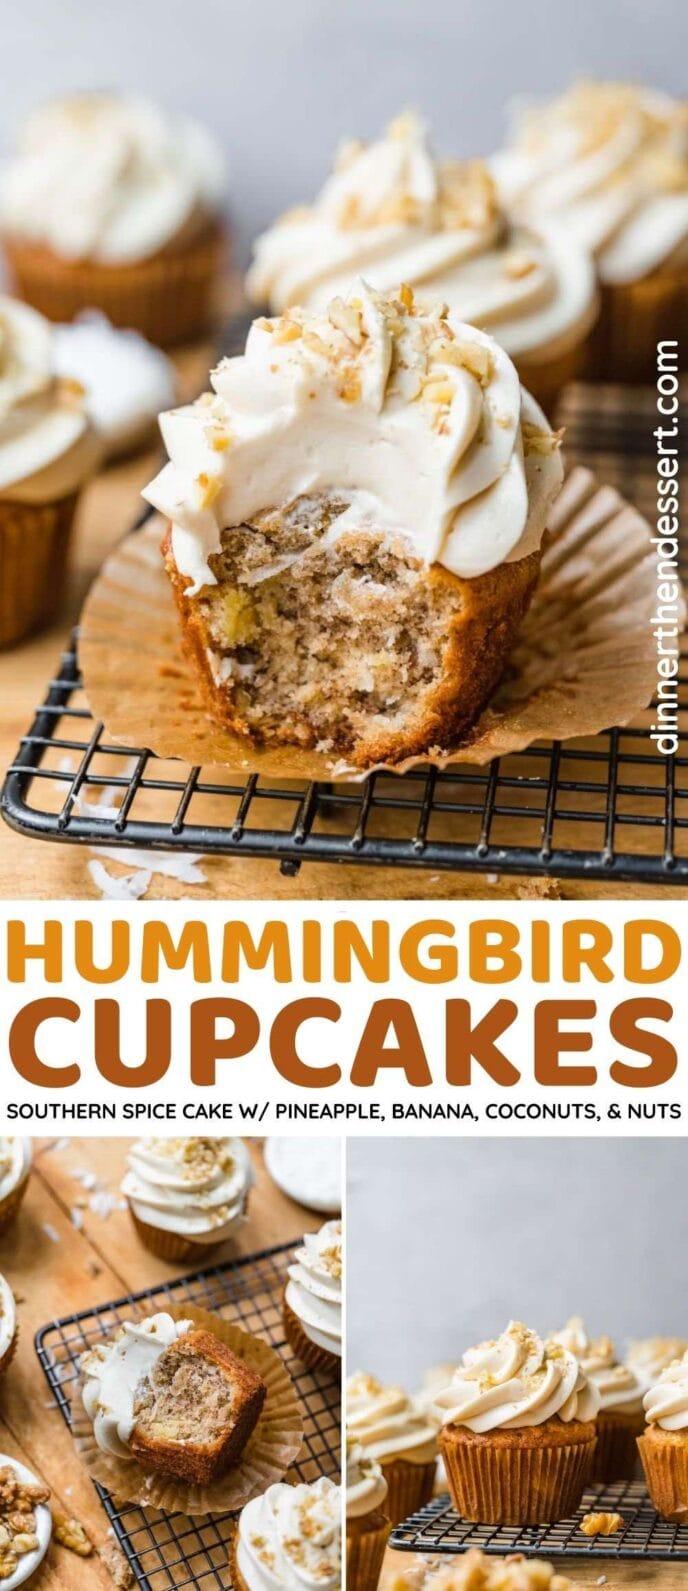 Hummingbird Cupcakes collage